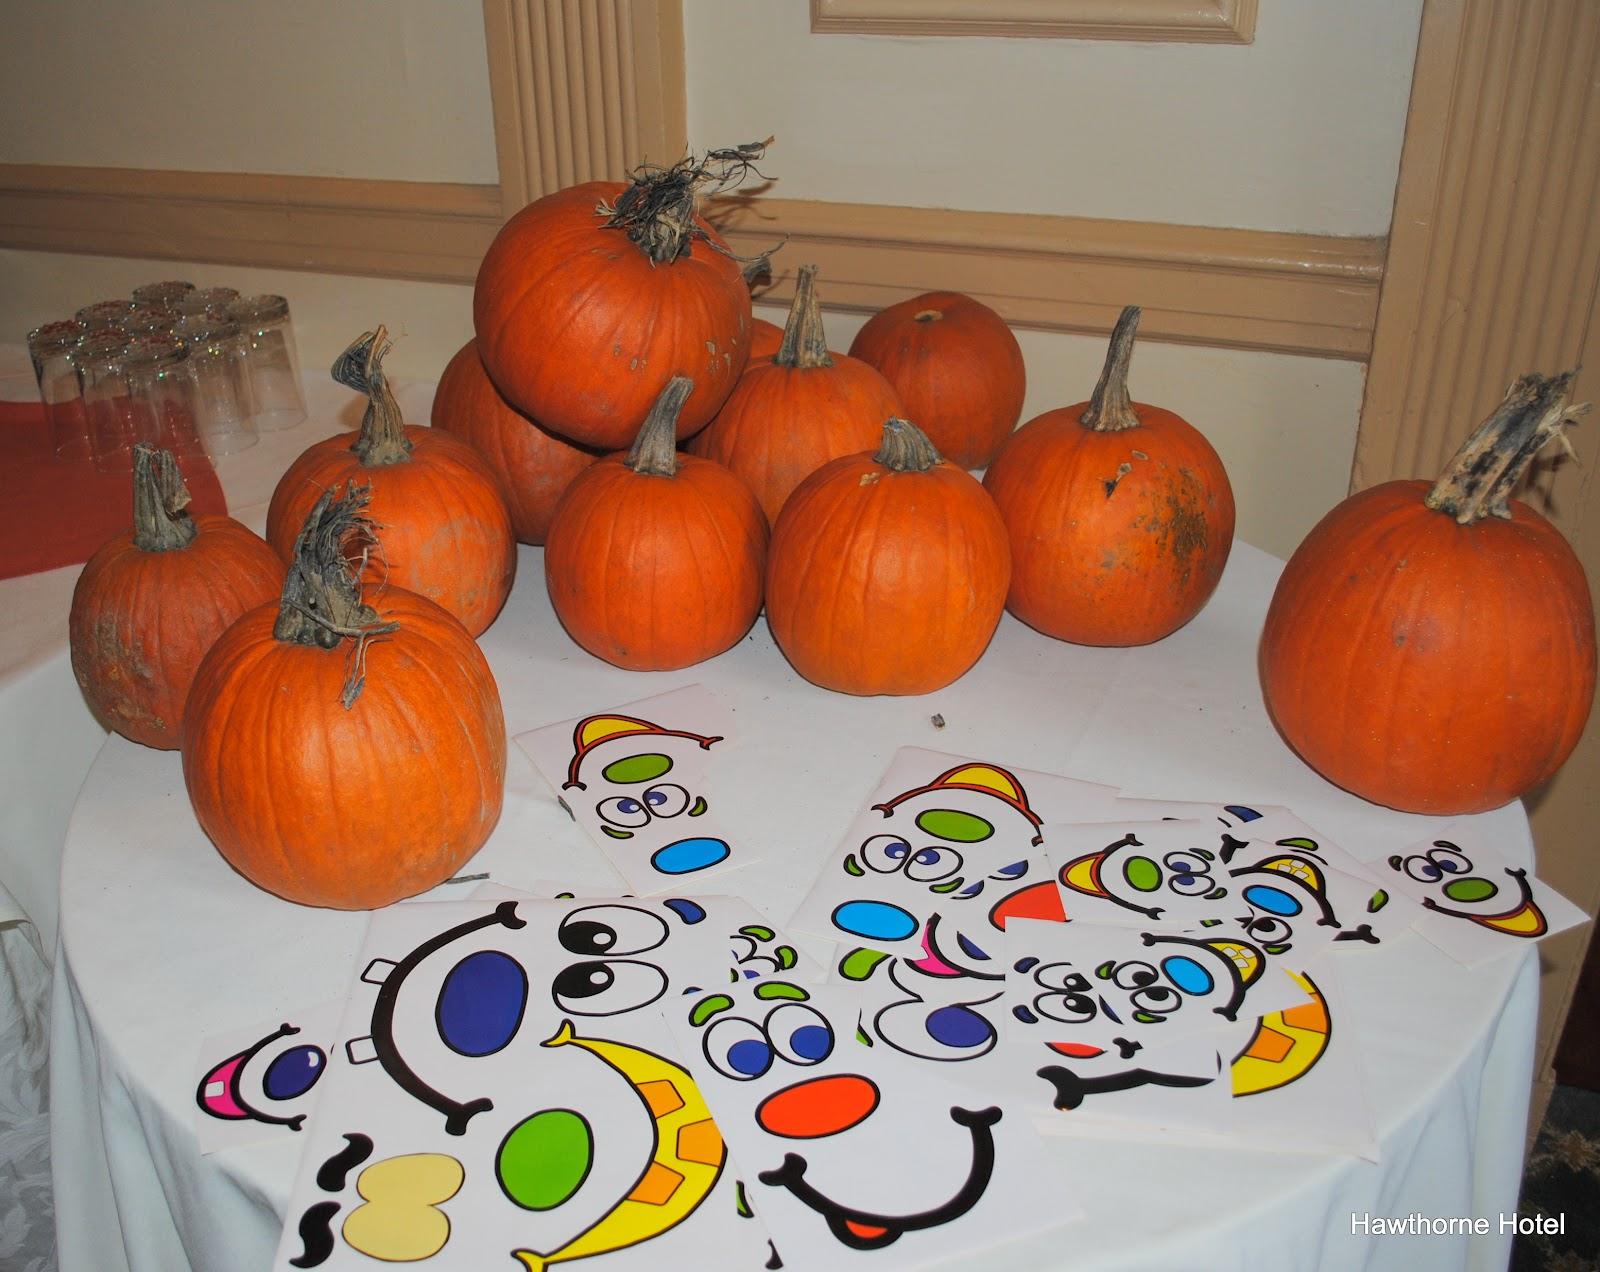 Hawthorne Hotel: UPDATED Comprehensive October and Halloween ...